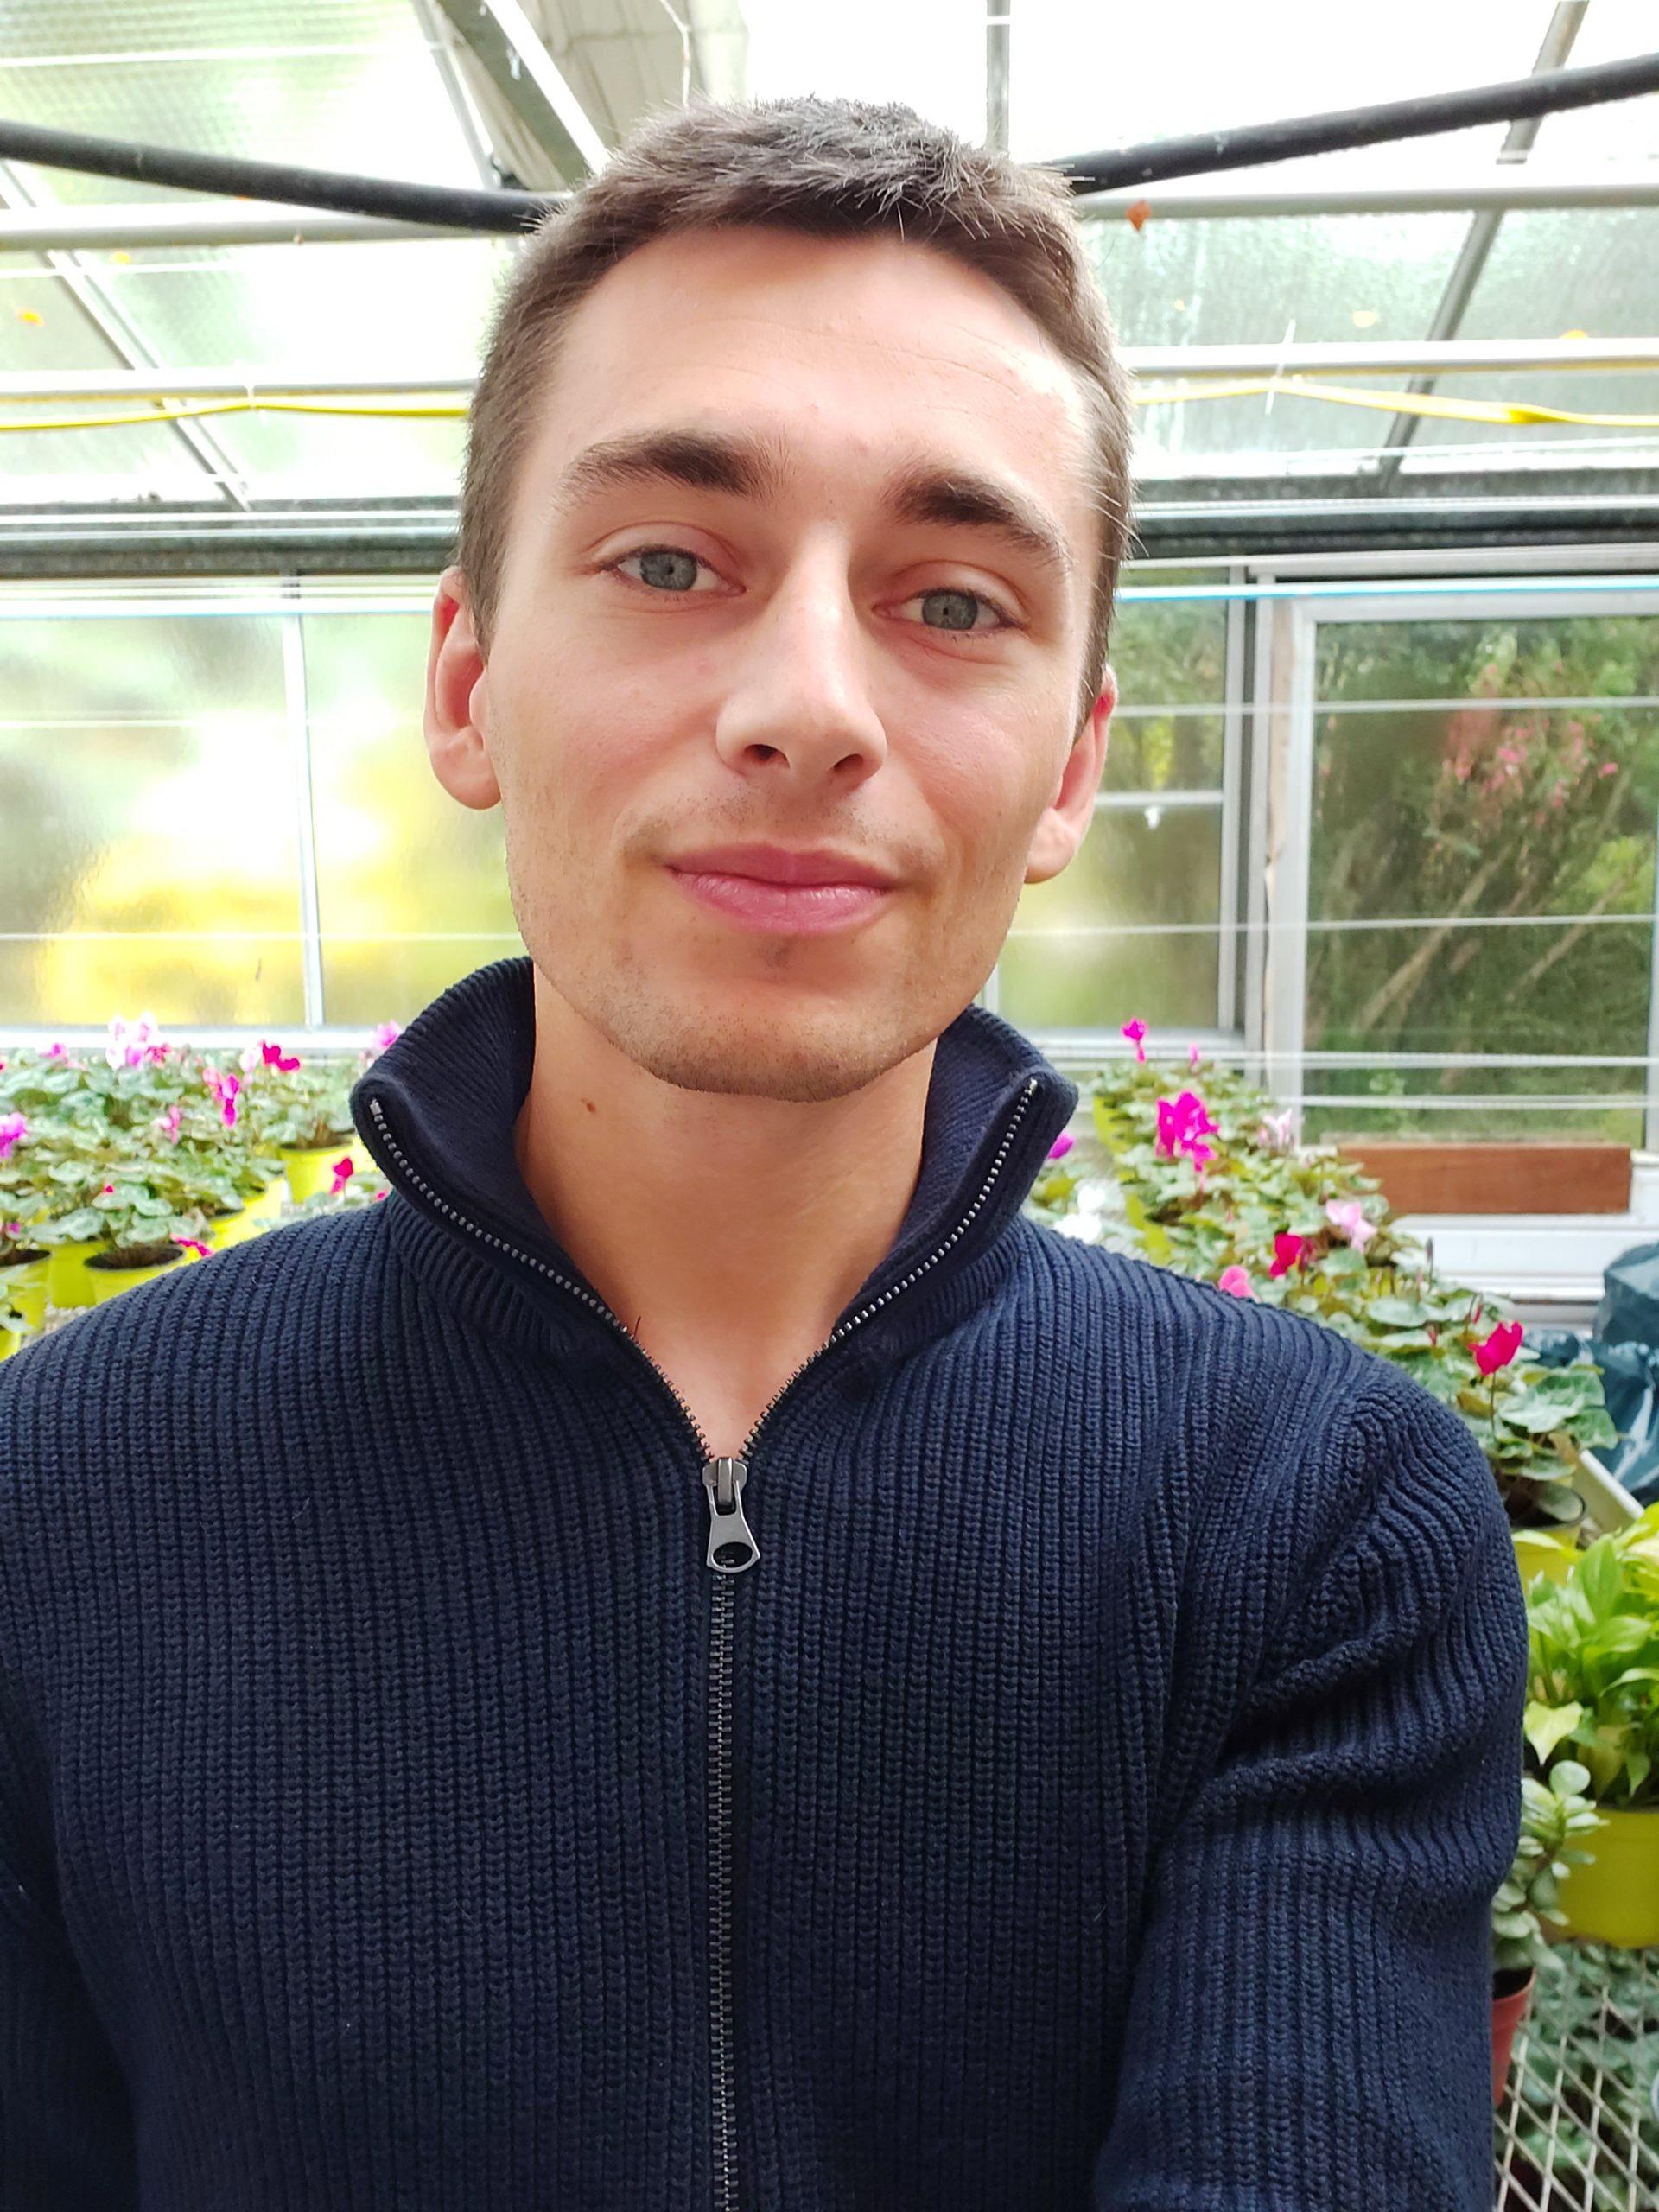 Maxime Vautier